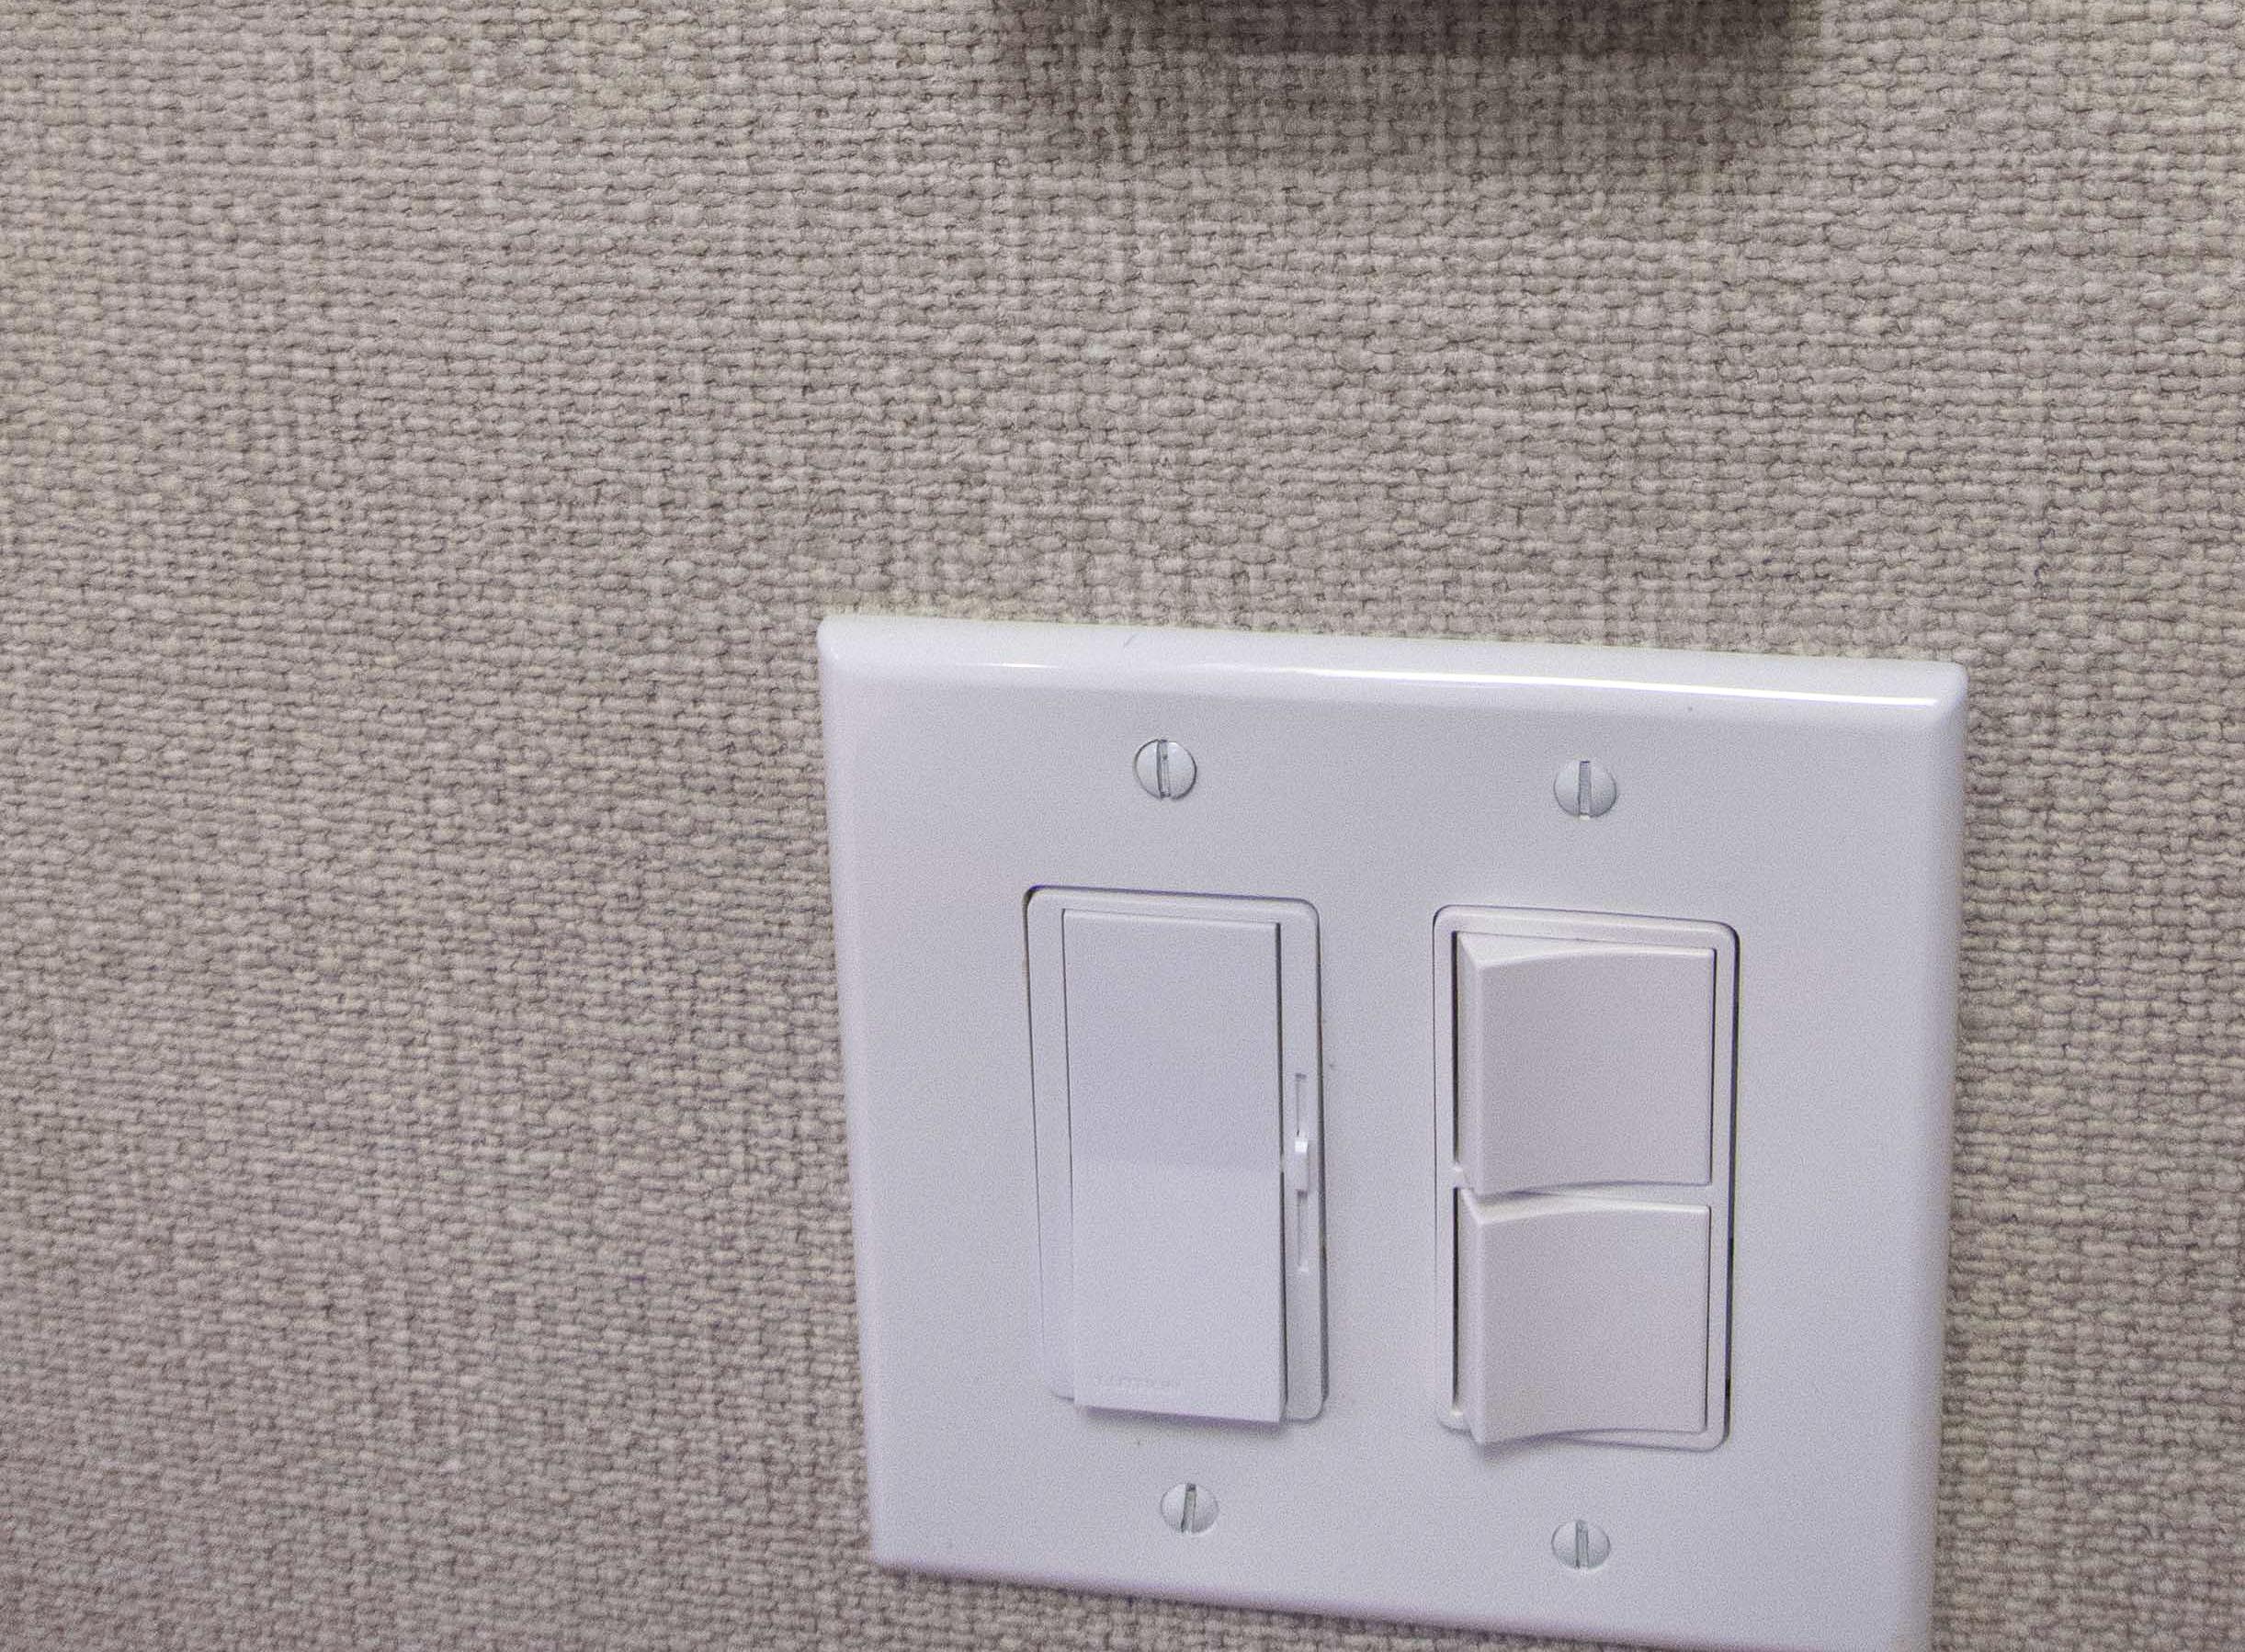 Lighting Switch-3190.jpg